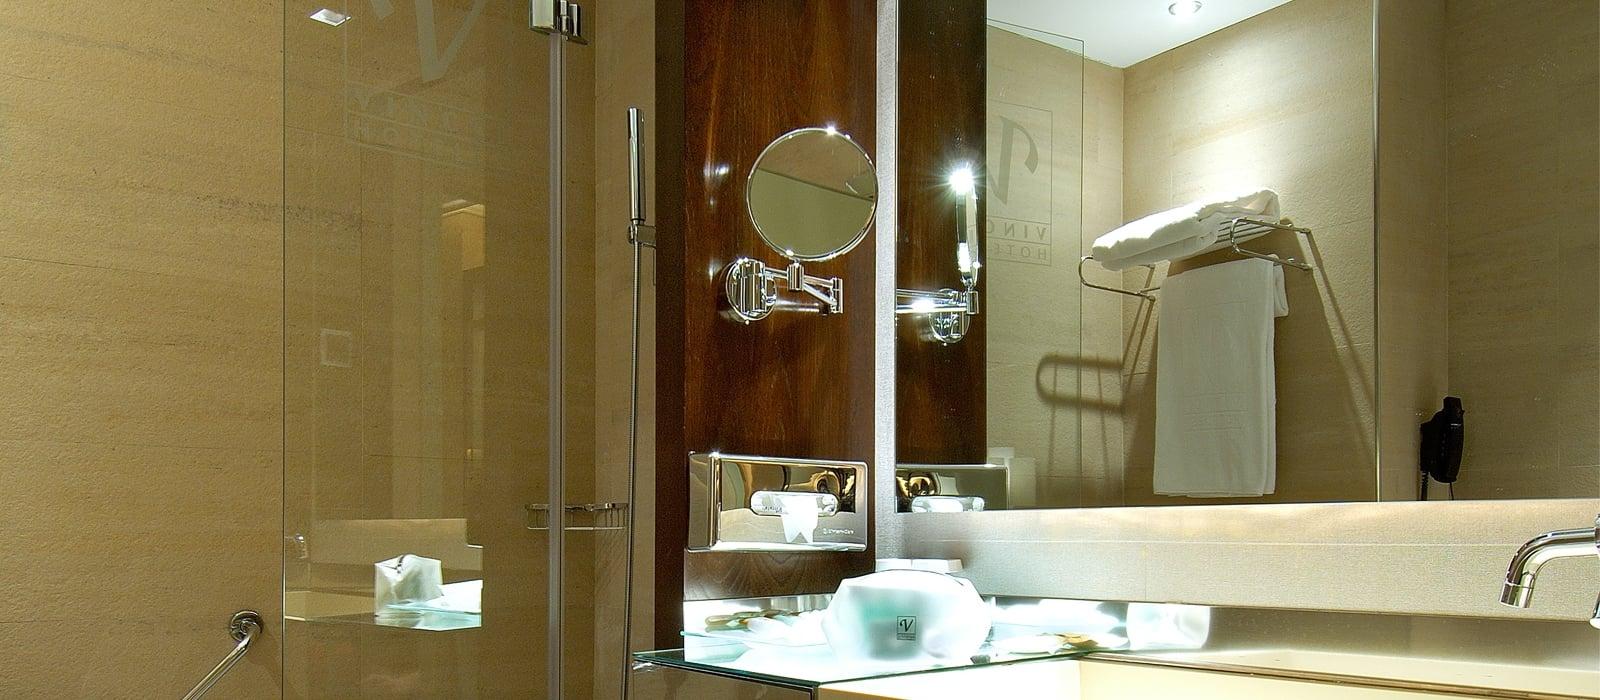 Habitaciones Hotel Madrid Capitol - Vincci Hoteles - Vincci Doble